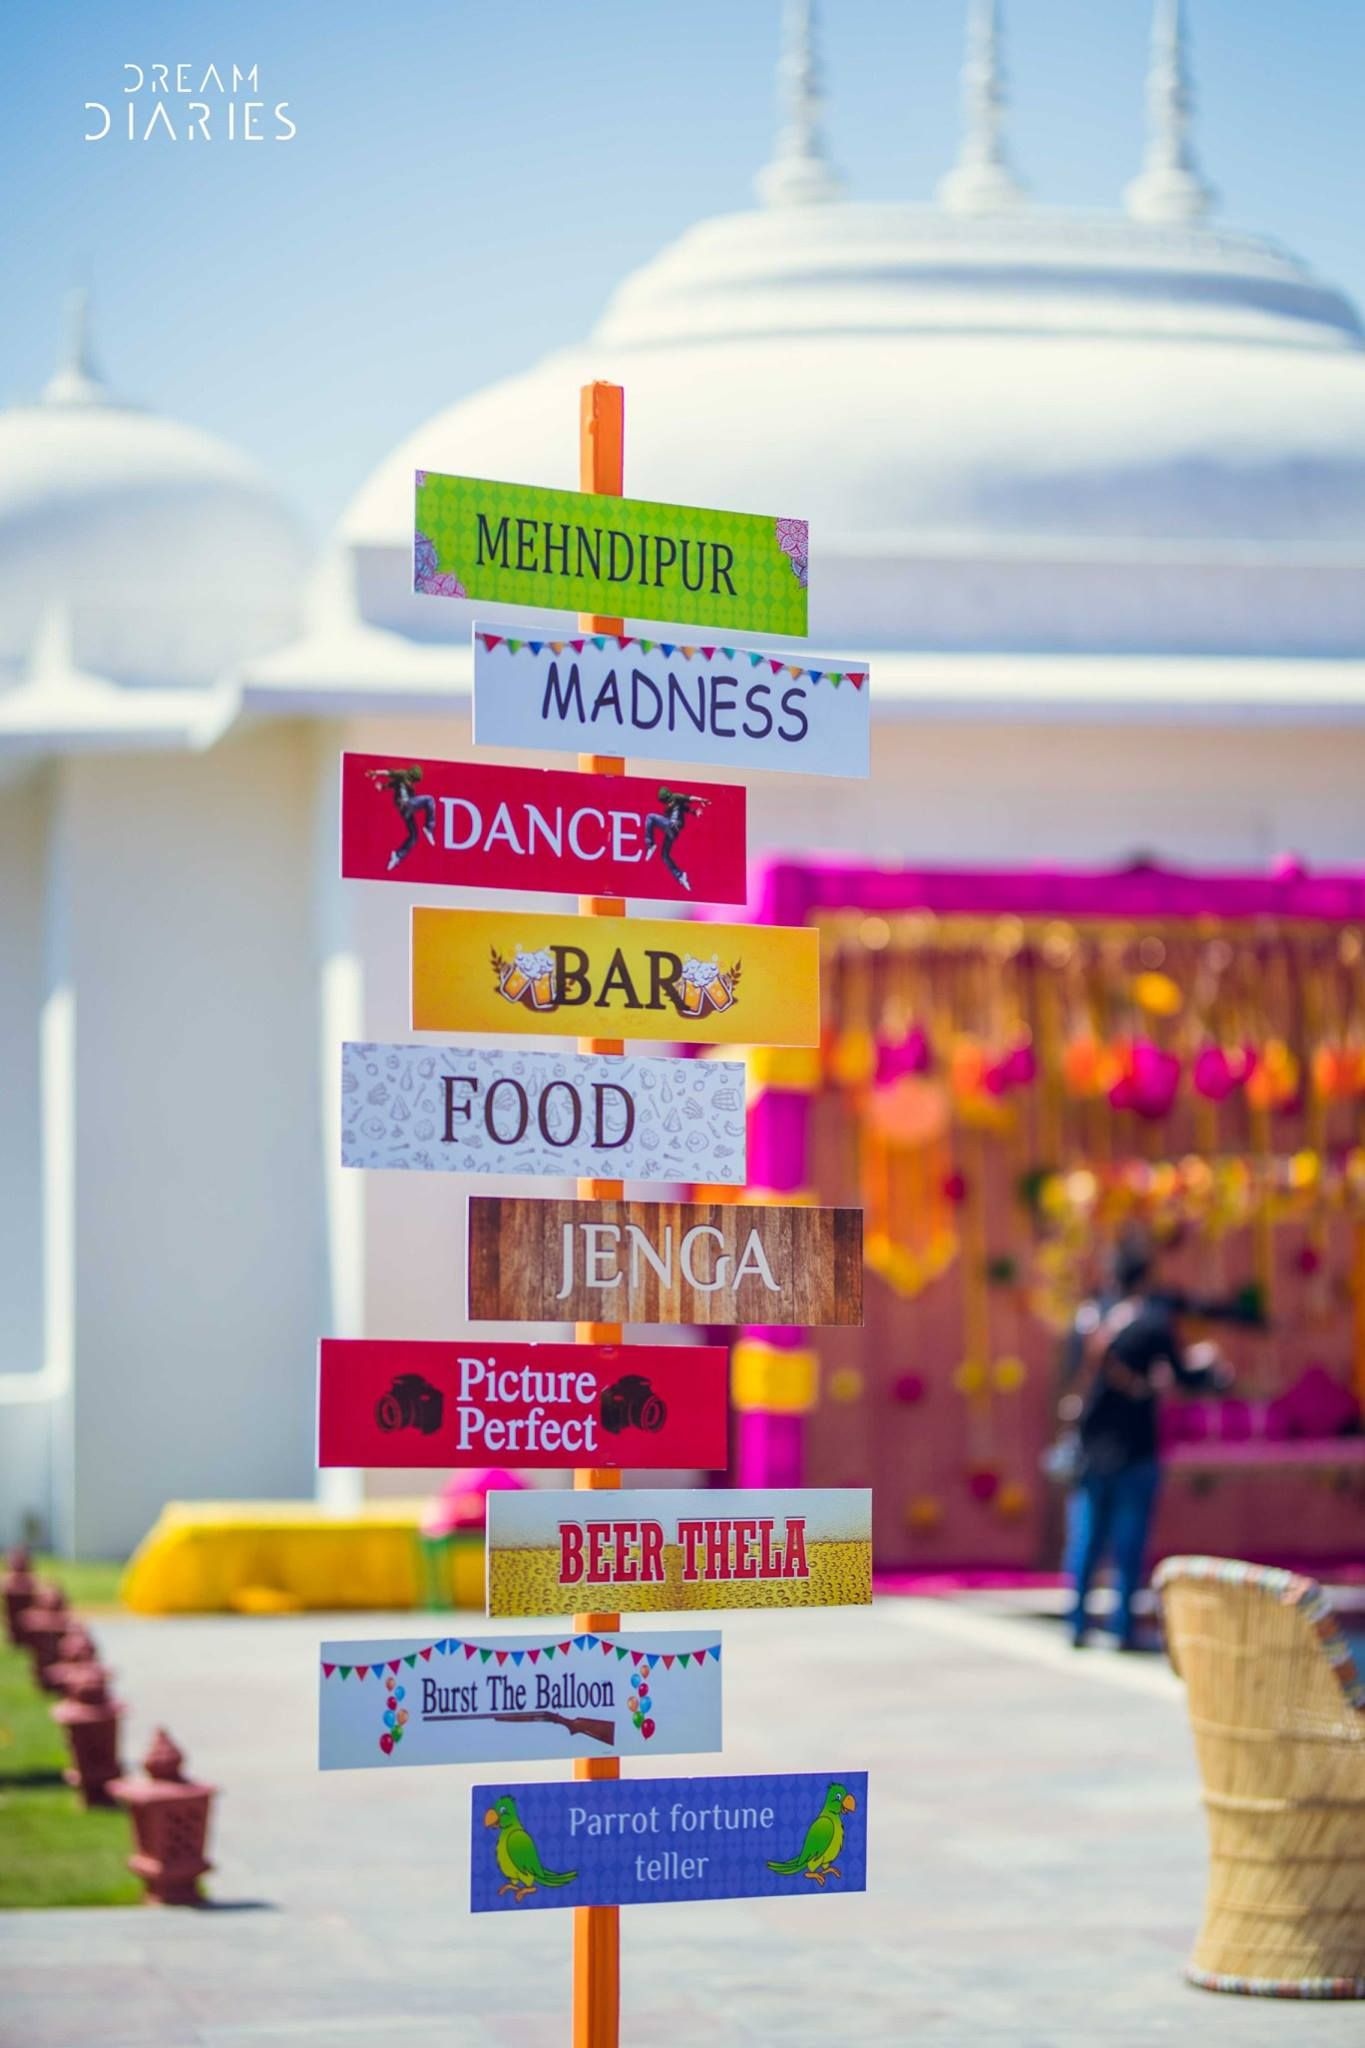 Free fun diy mehndi theme with fab indian kitsch mehndi decor ideas mehendi decor inspiration sign boards mela theme mehendi function quirky mehendi decor junglespirit Image collections